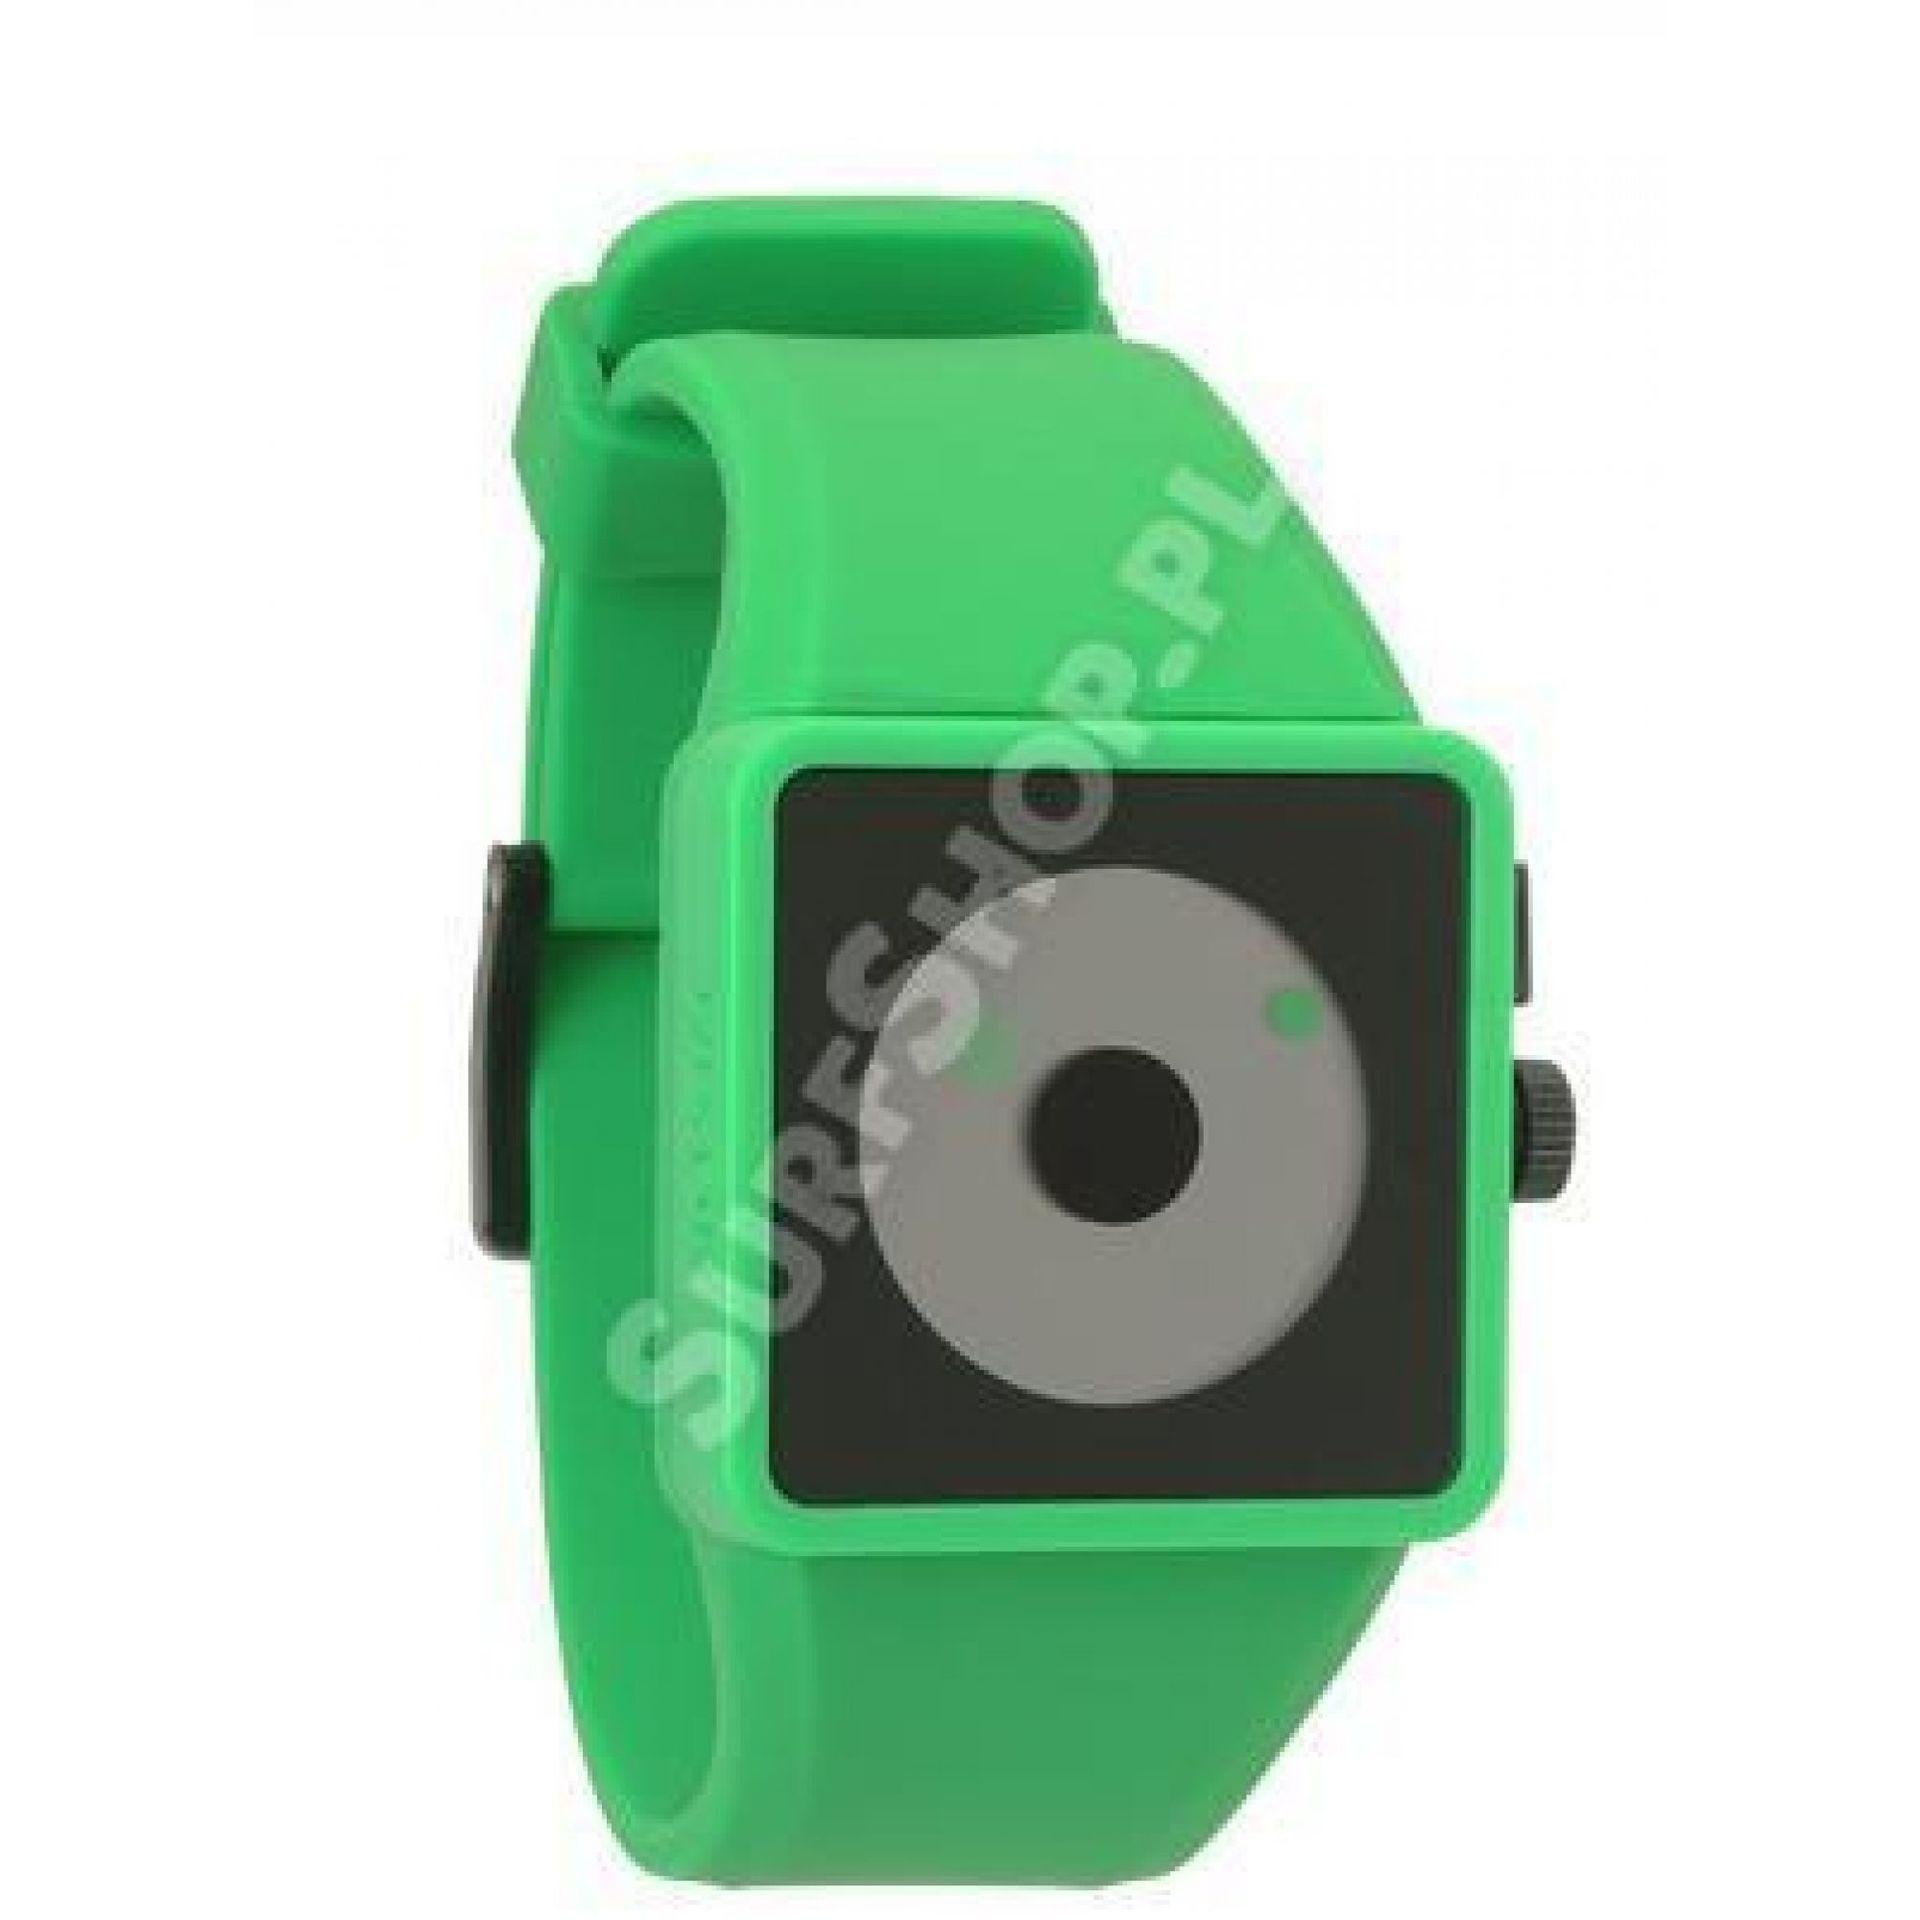 Zegarek Nixon Newton zielony 1